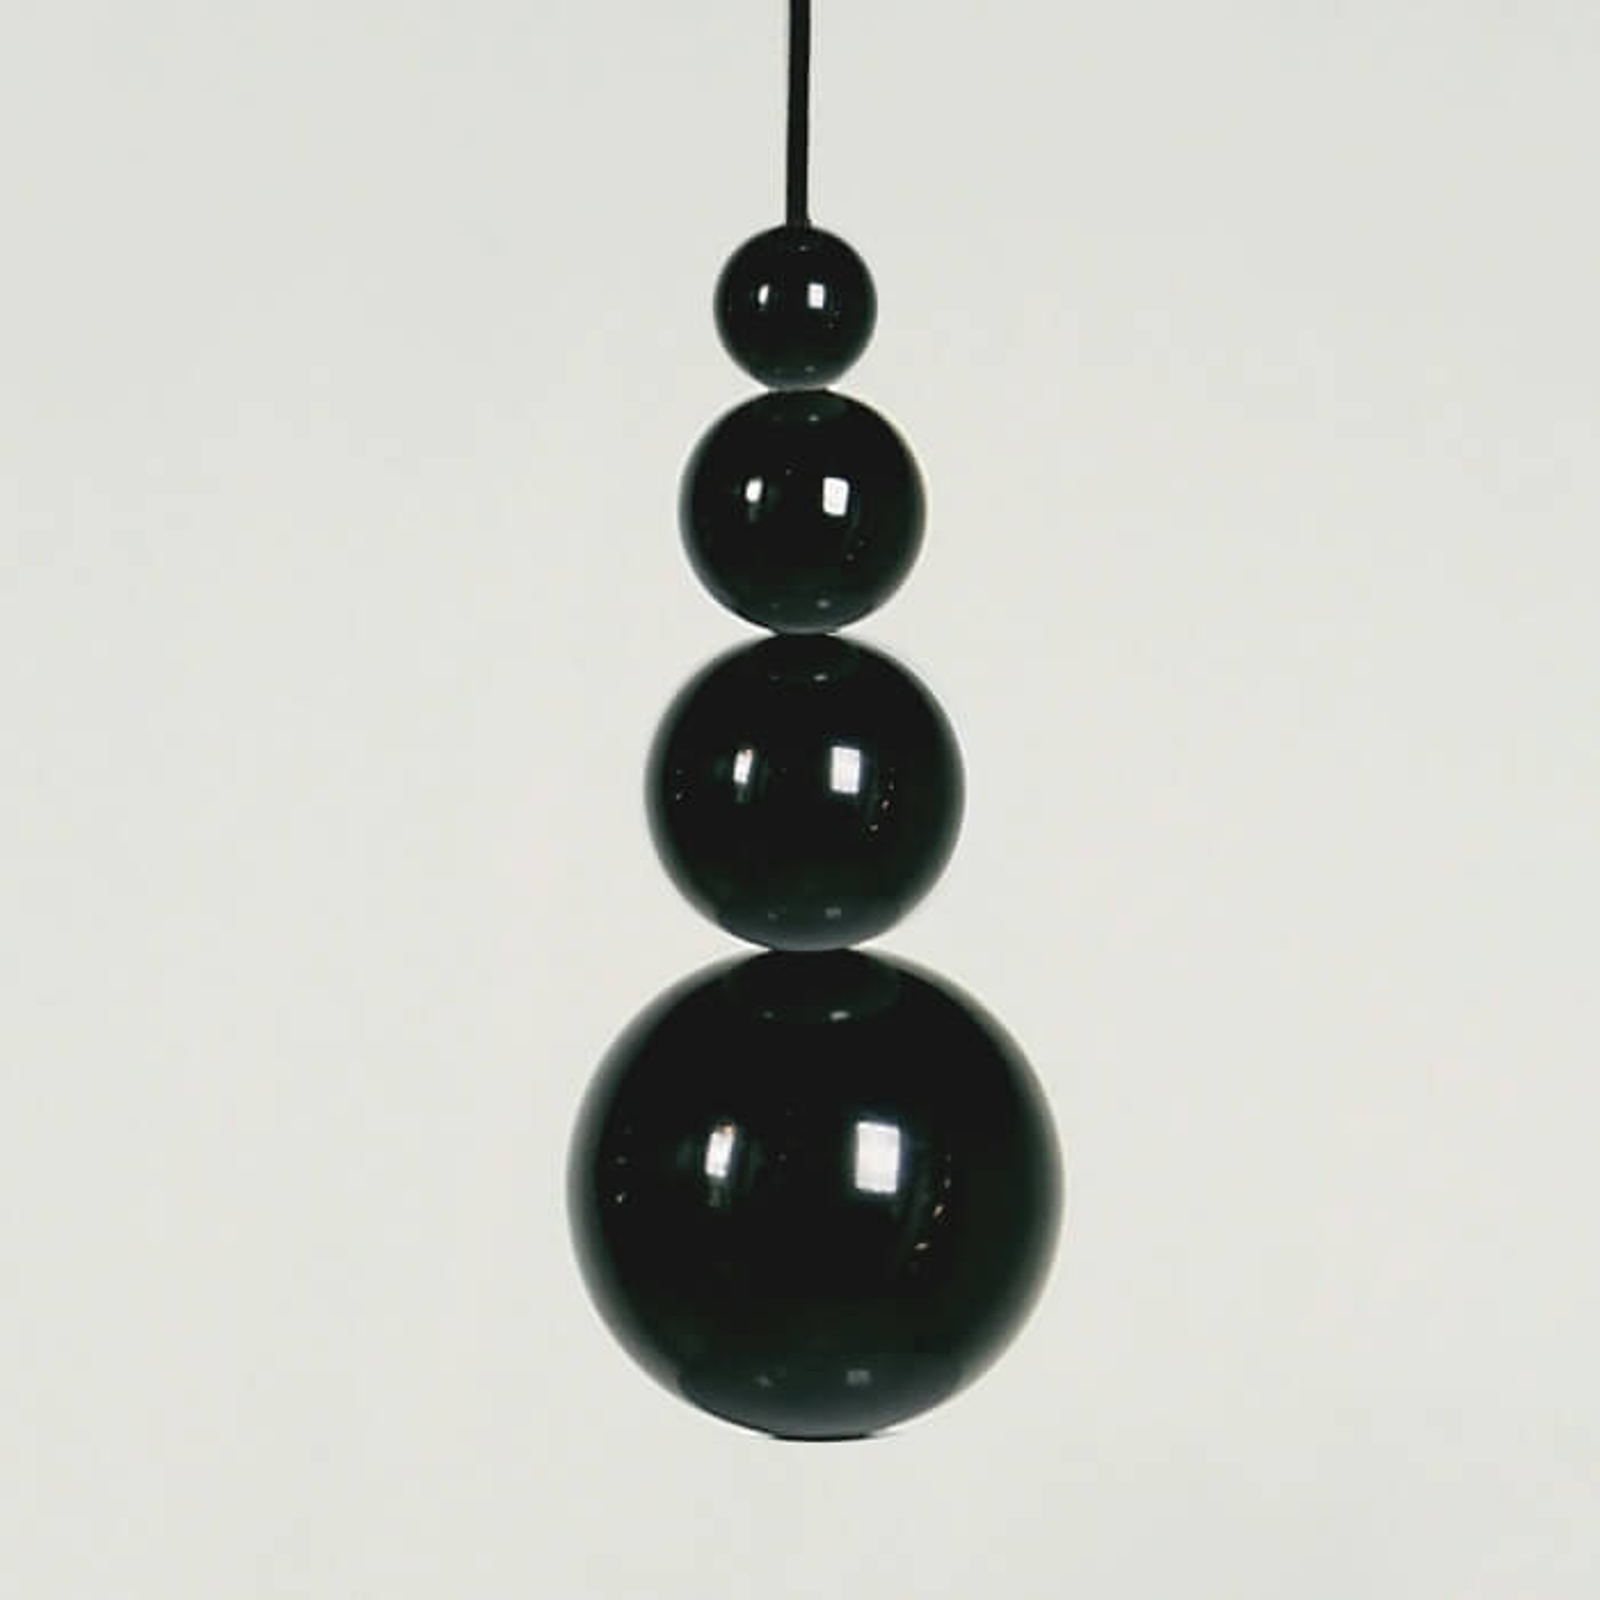 Innermost Bubble - hanglamp in zwart